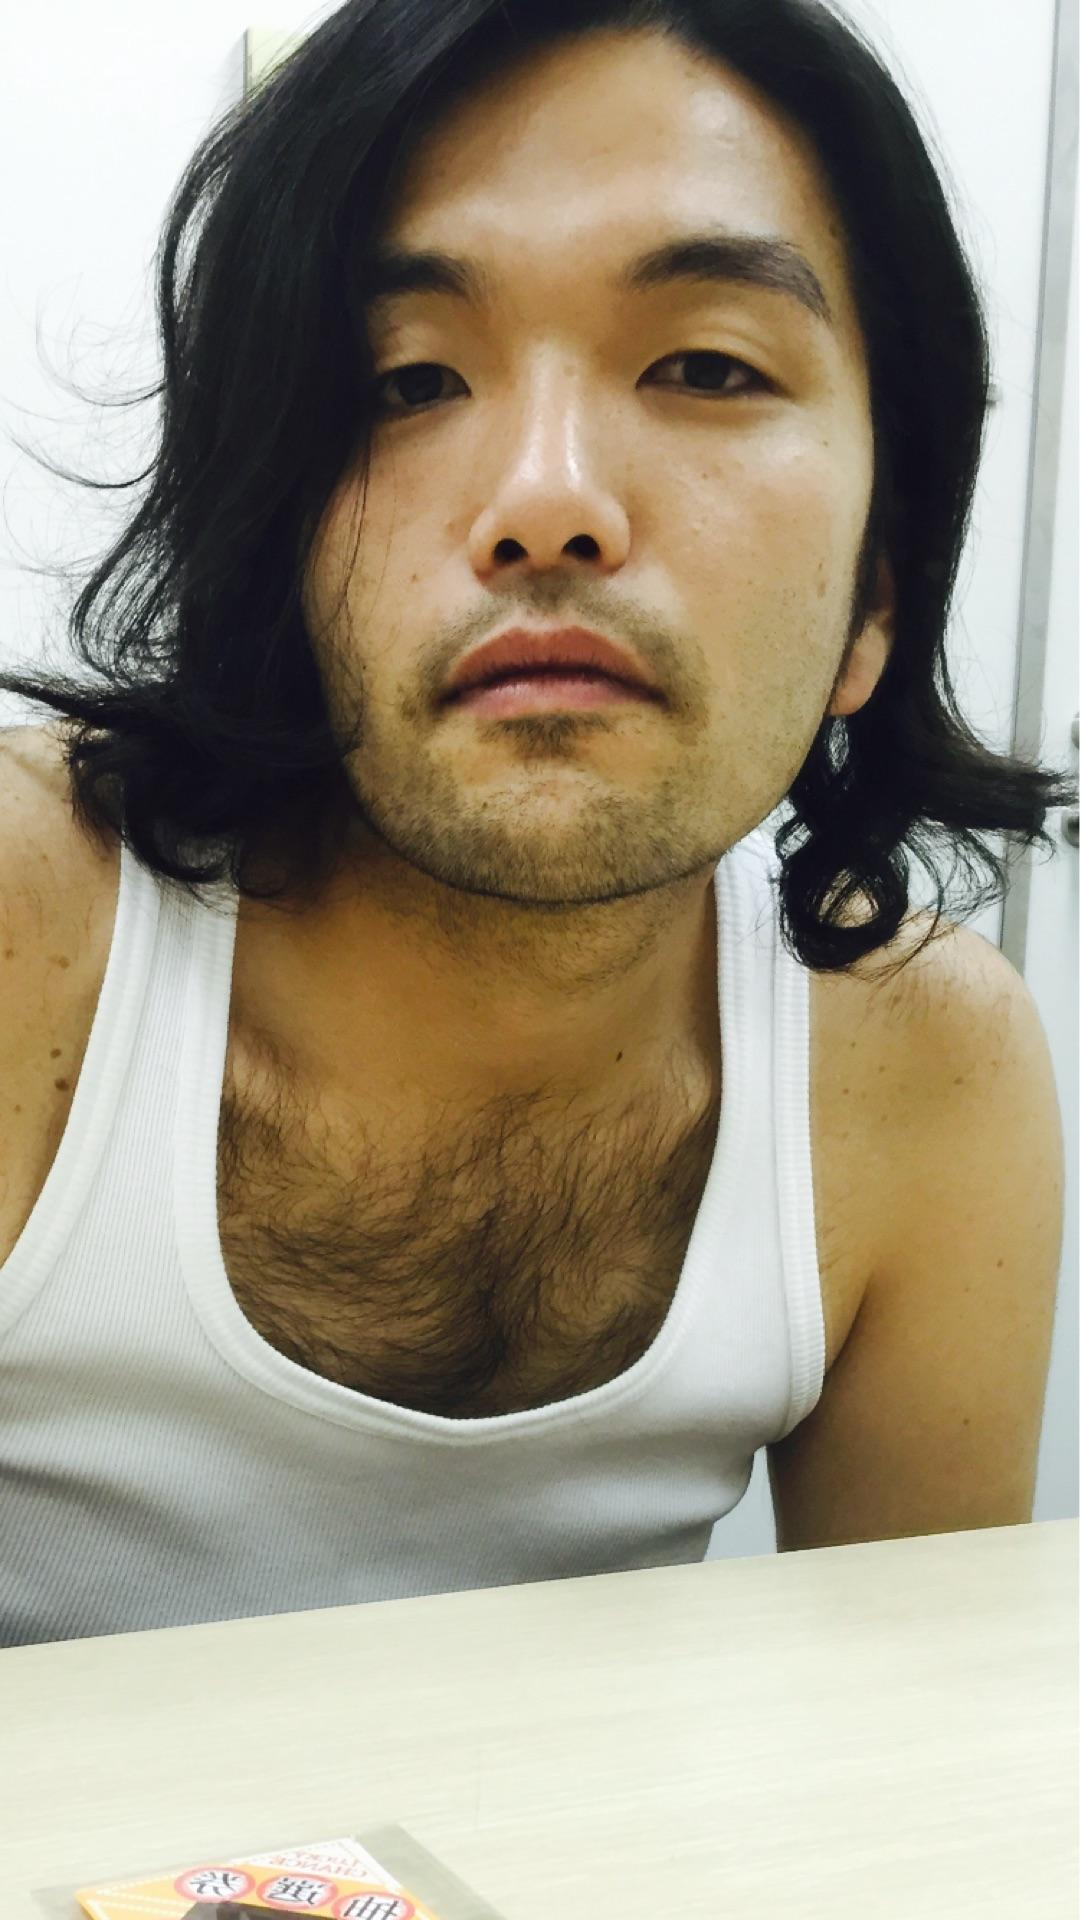 「見取り図 盛山 胸毛」の画像検索結果